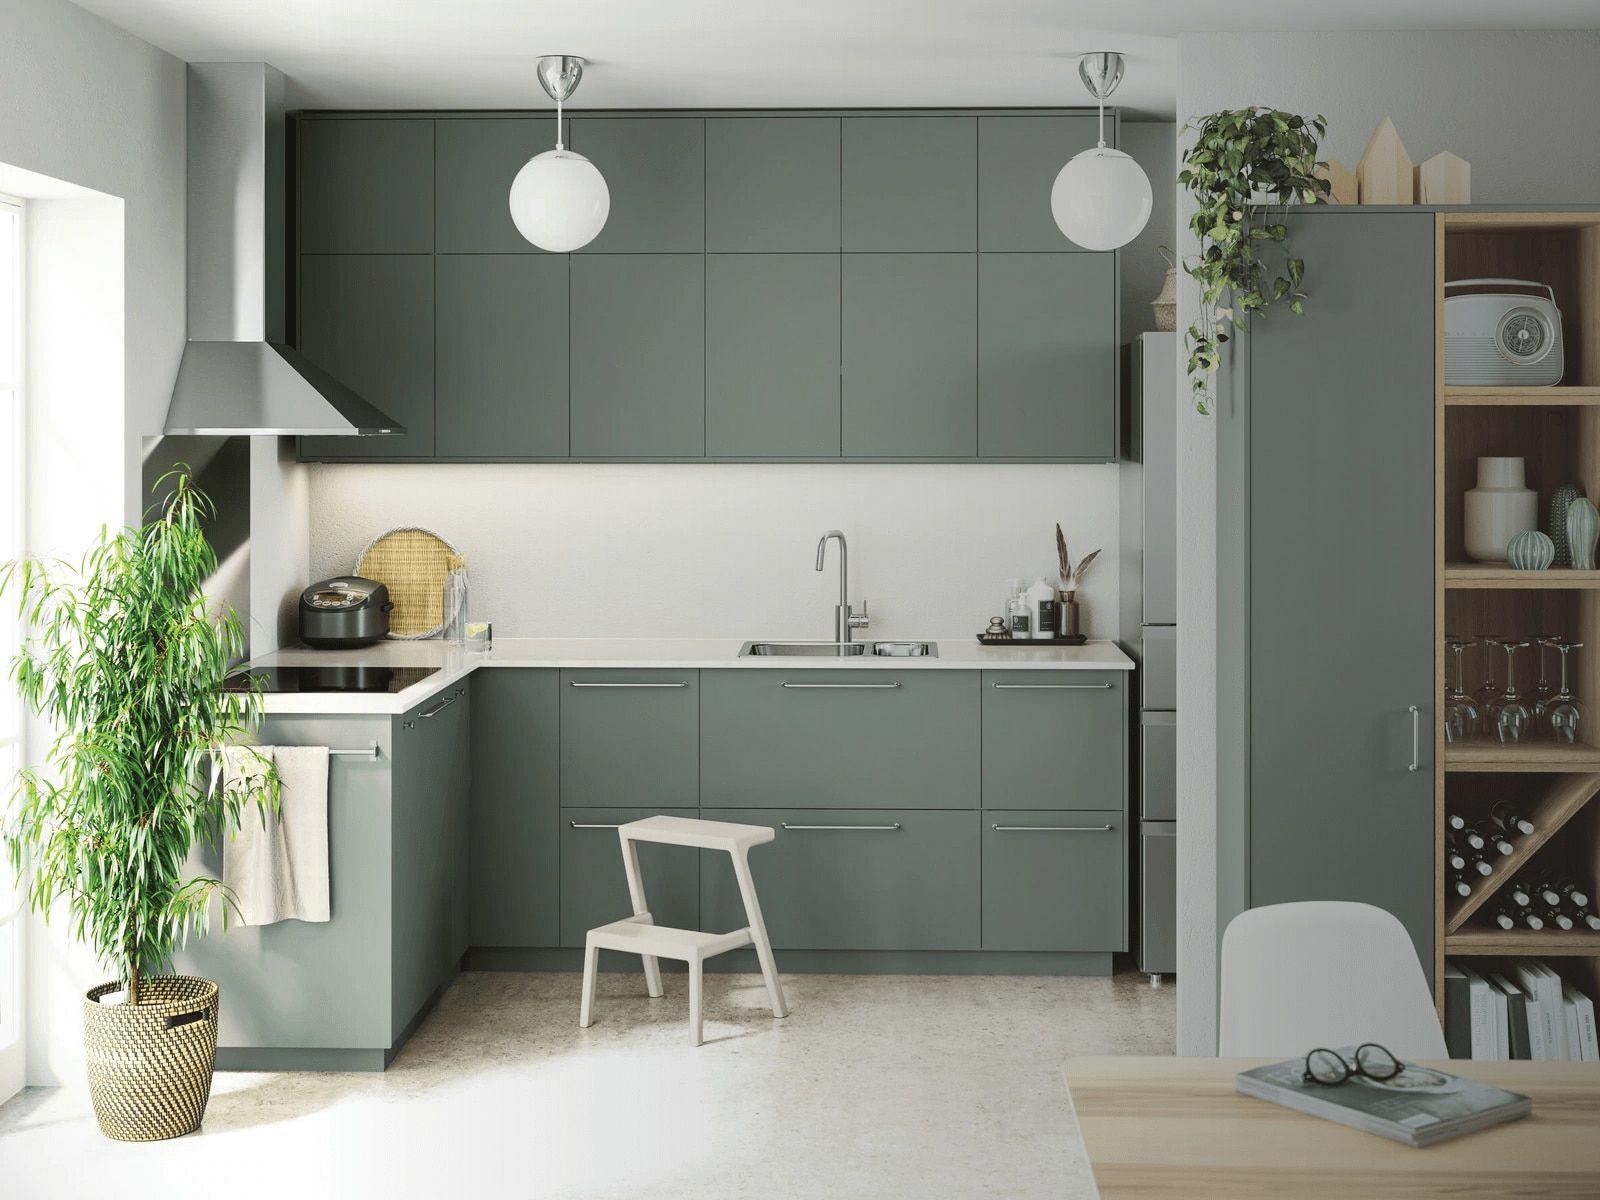 Ikea Metod Kitchen Ikea Kitchen Design Minimalist Kitchen Design Interior Design Kitchen Ikea design a kitchen